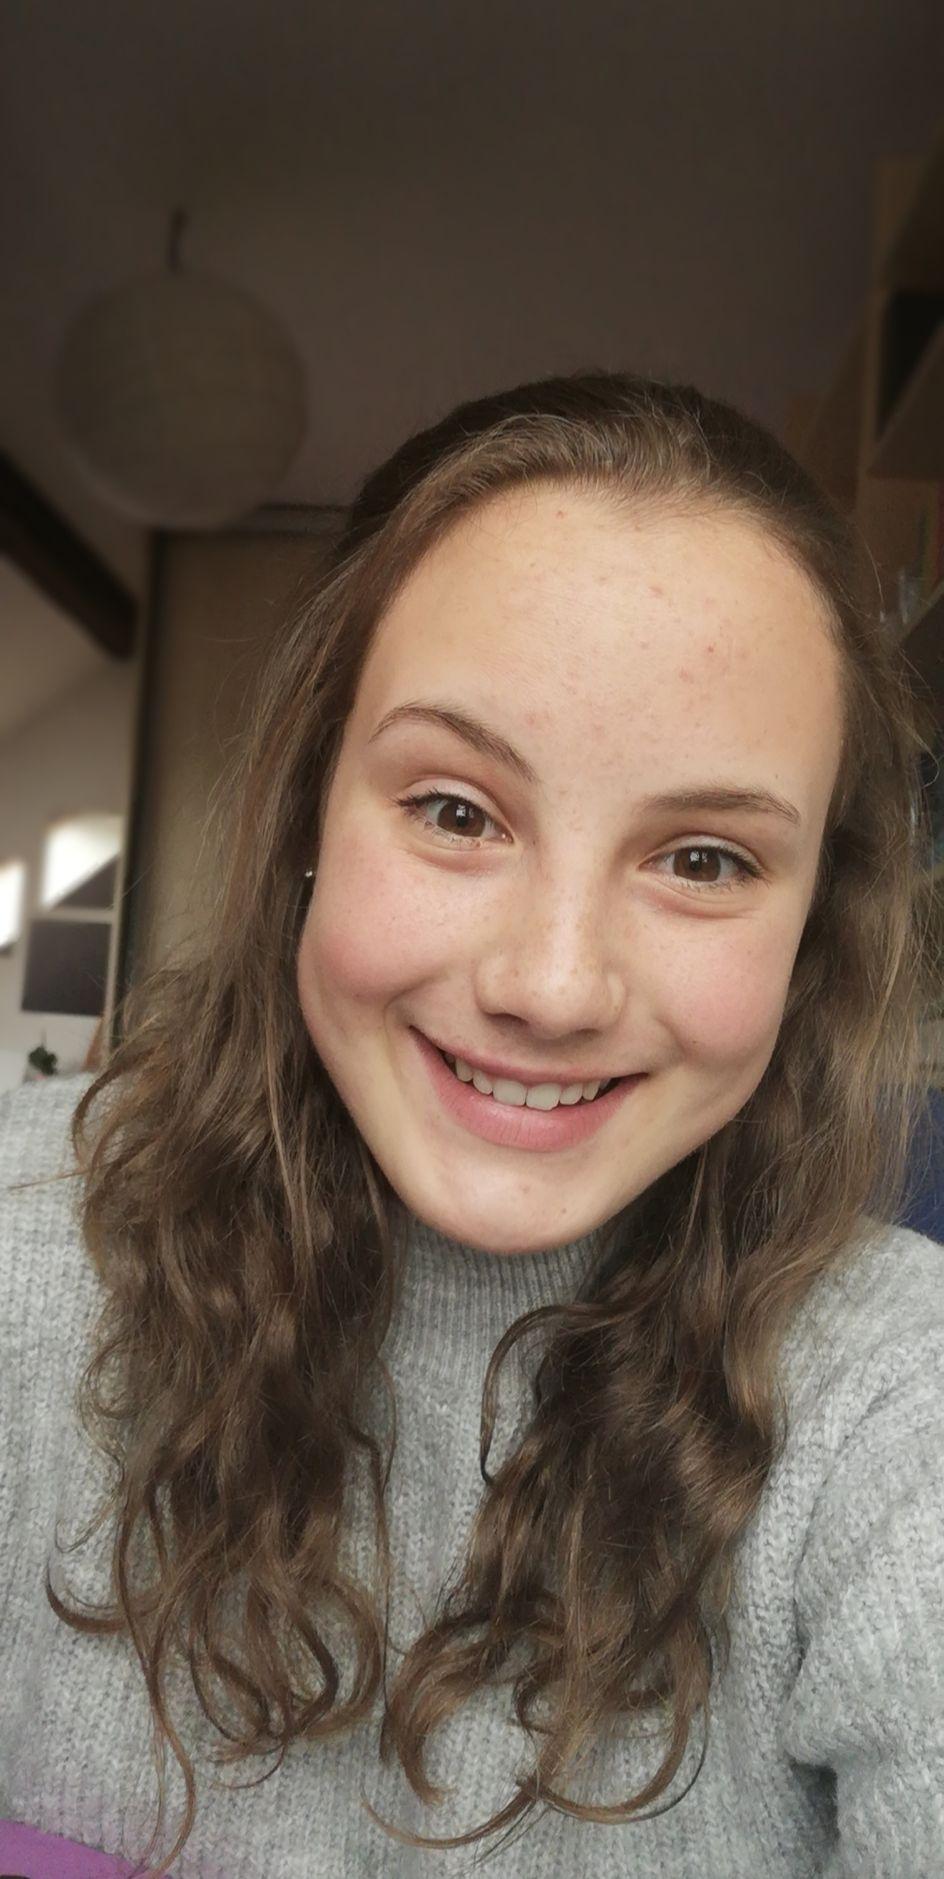 Karolína Řehořová, 15 let, Tymákov